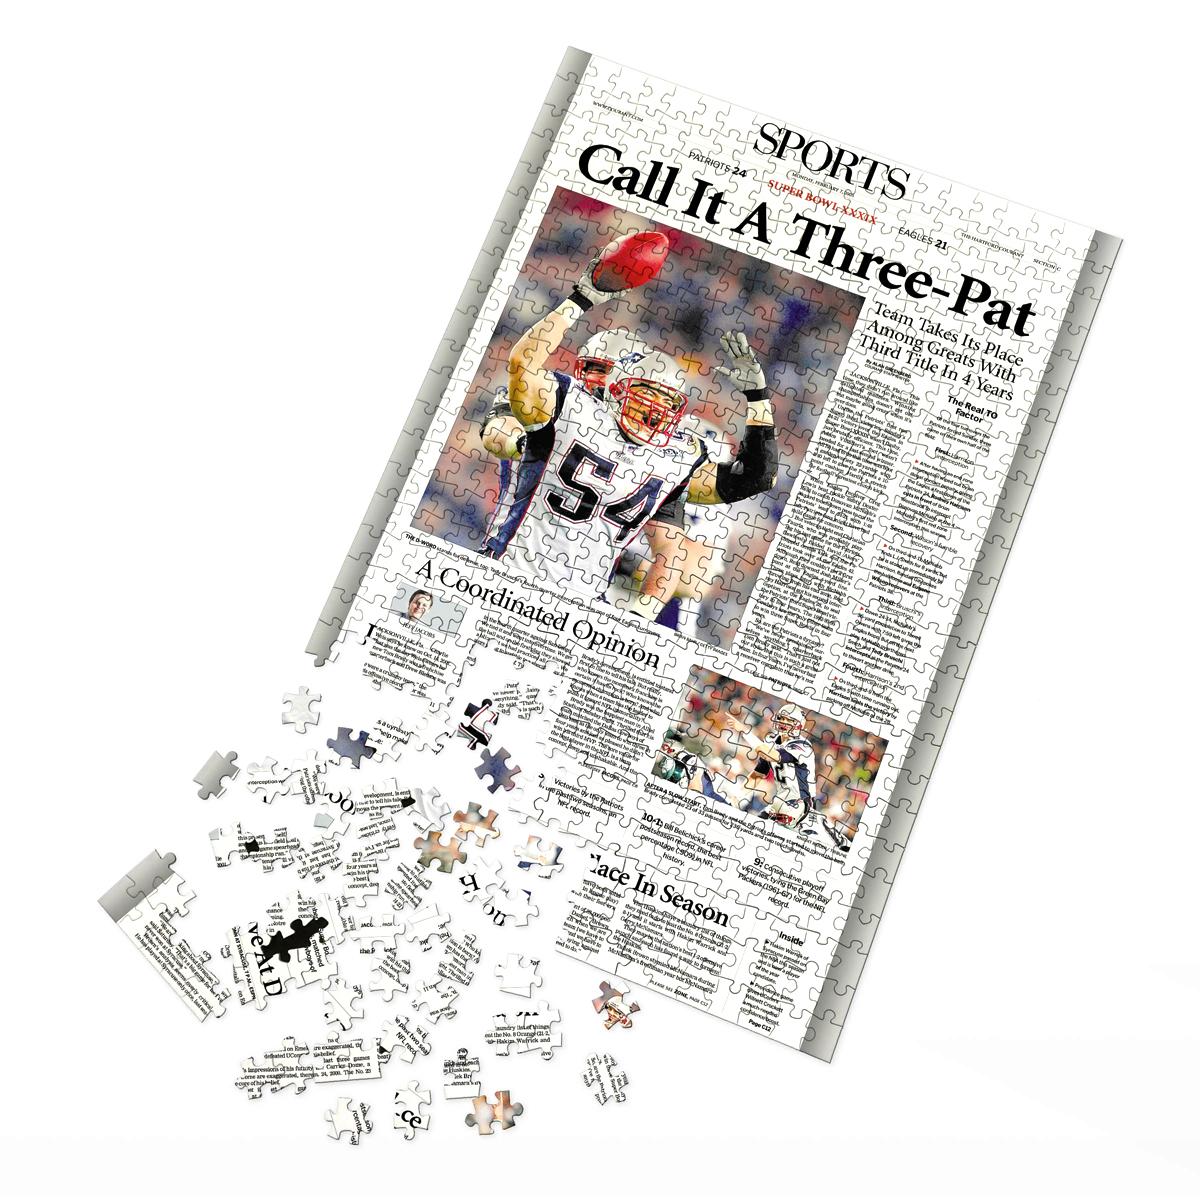 New England Patriots Super Bowl XXXIX Championship Jigsaw Puzzle